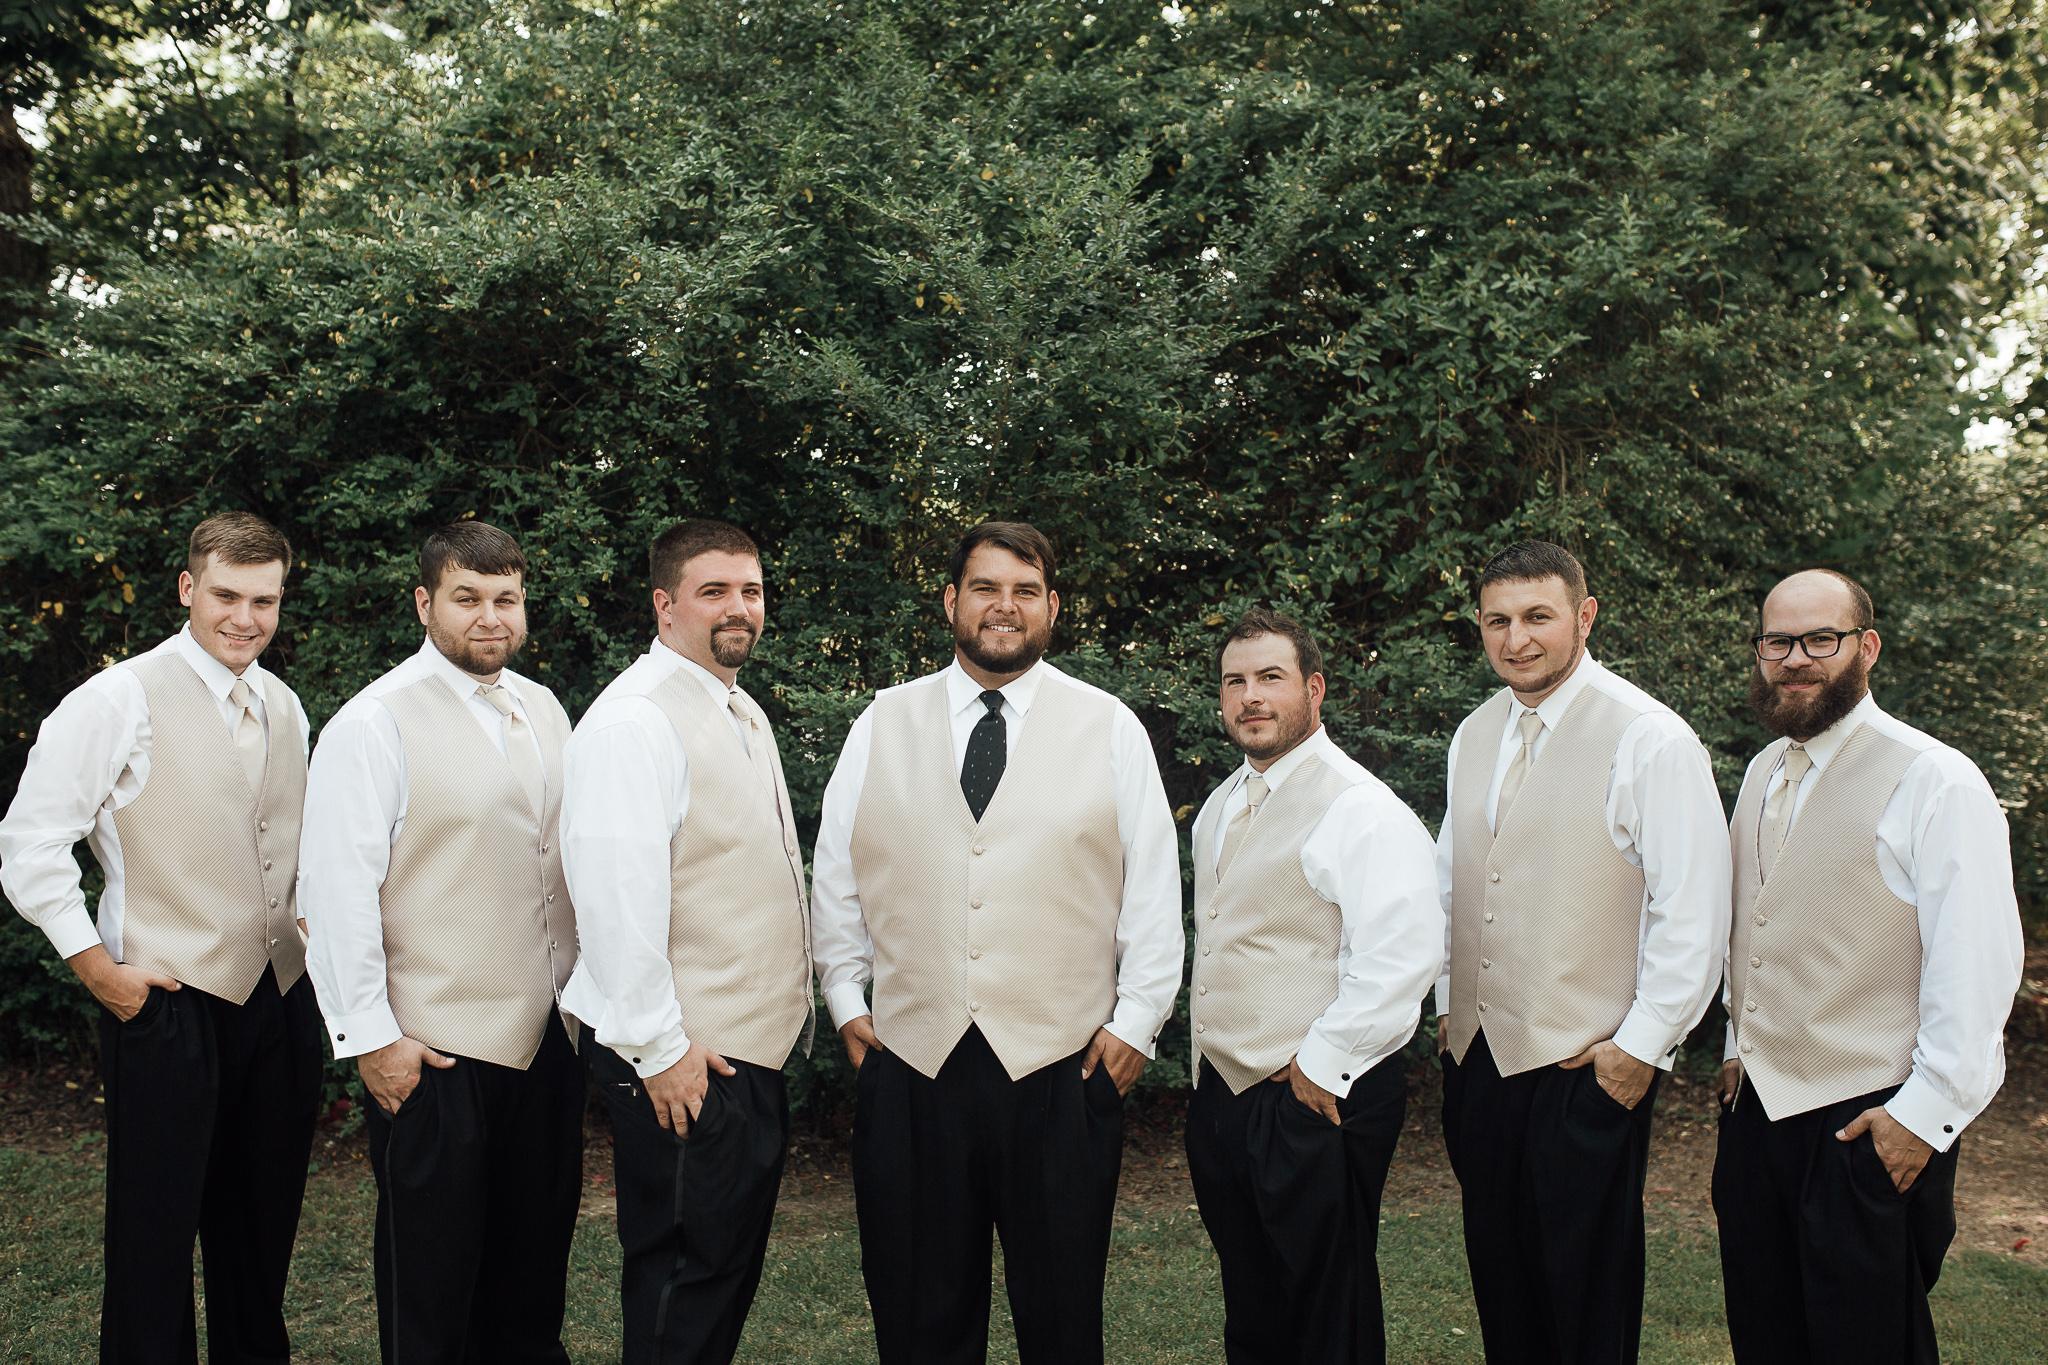 cassie-cook-photography-memphis-wedding-photographer-fountain-south-inn-groomsmen